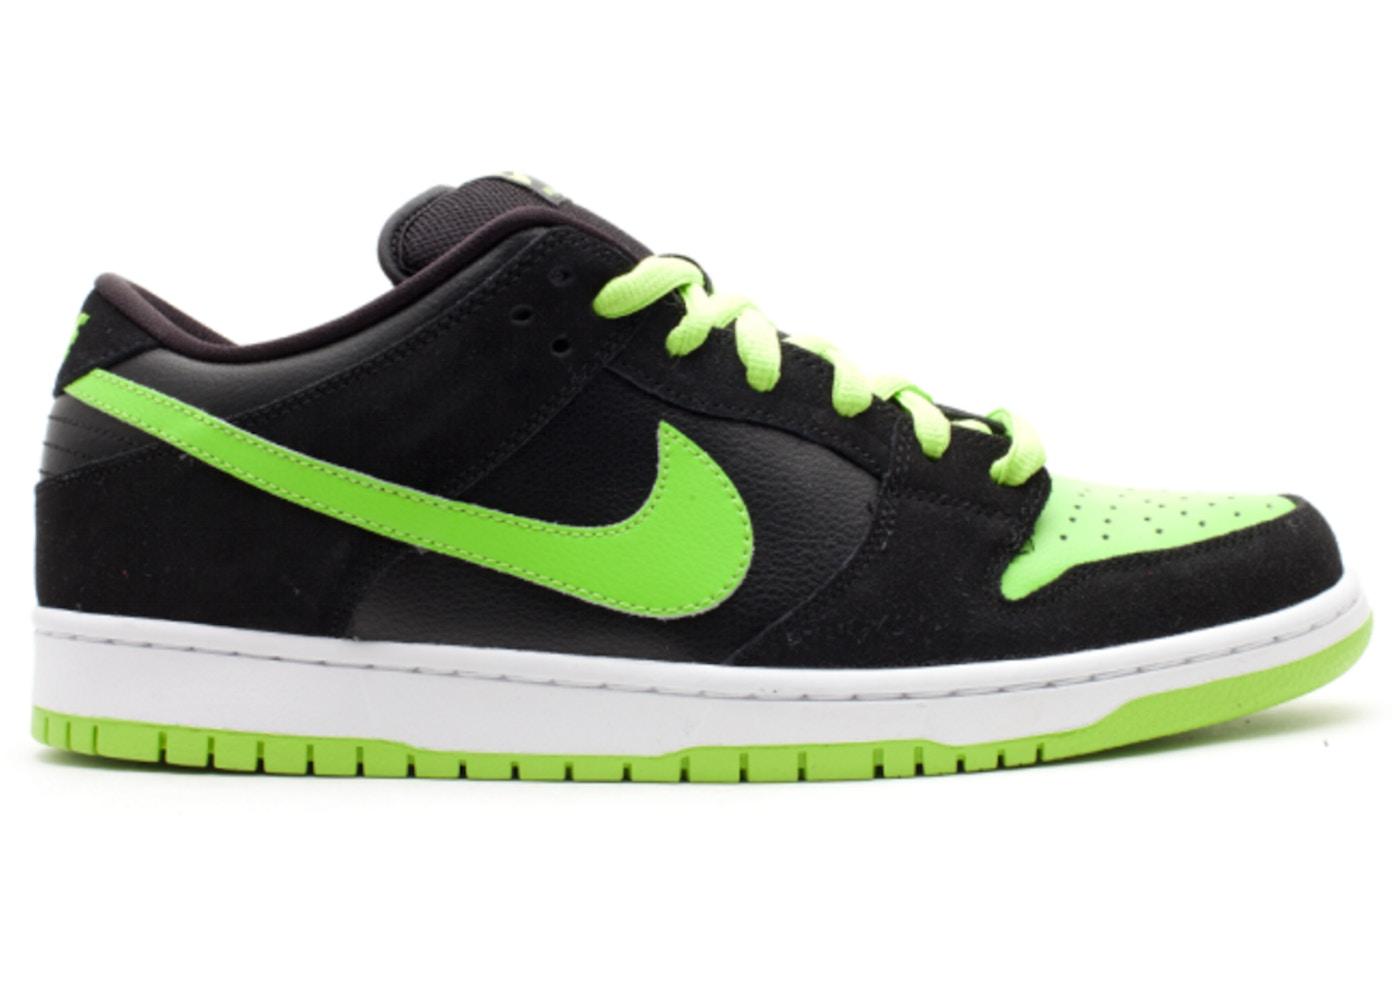 save off 4b738 45b0a Nike Dunk SB Low Neon J Pack - 304292-019